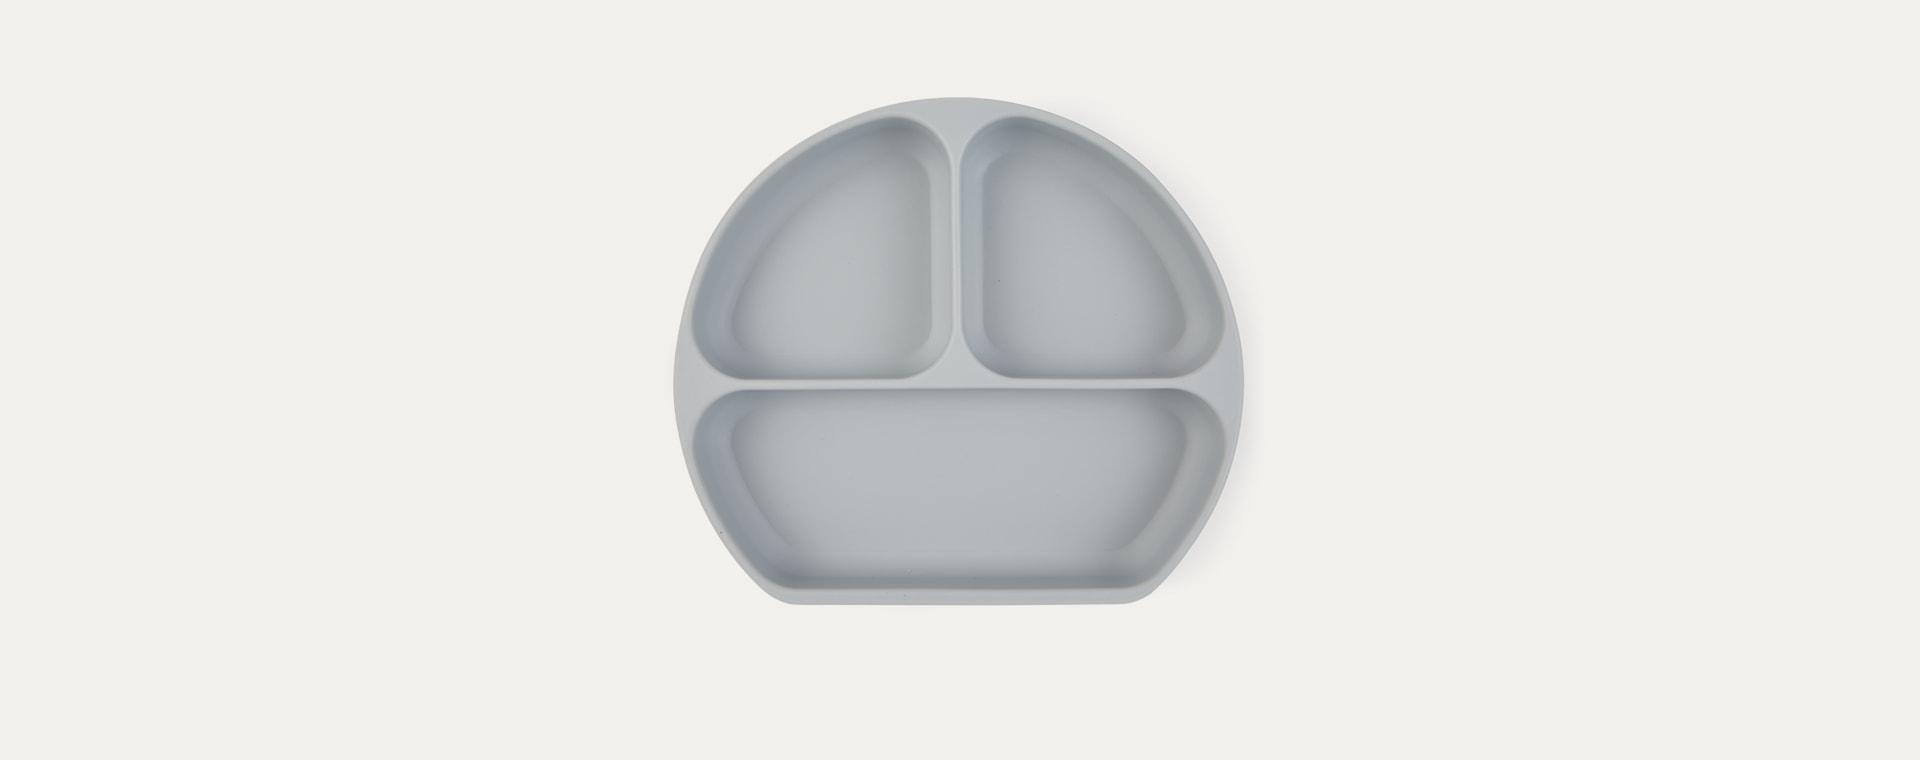 Grey Bumkins Silicone Suction Grip Dish